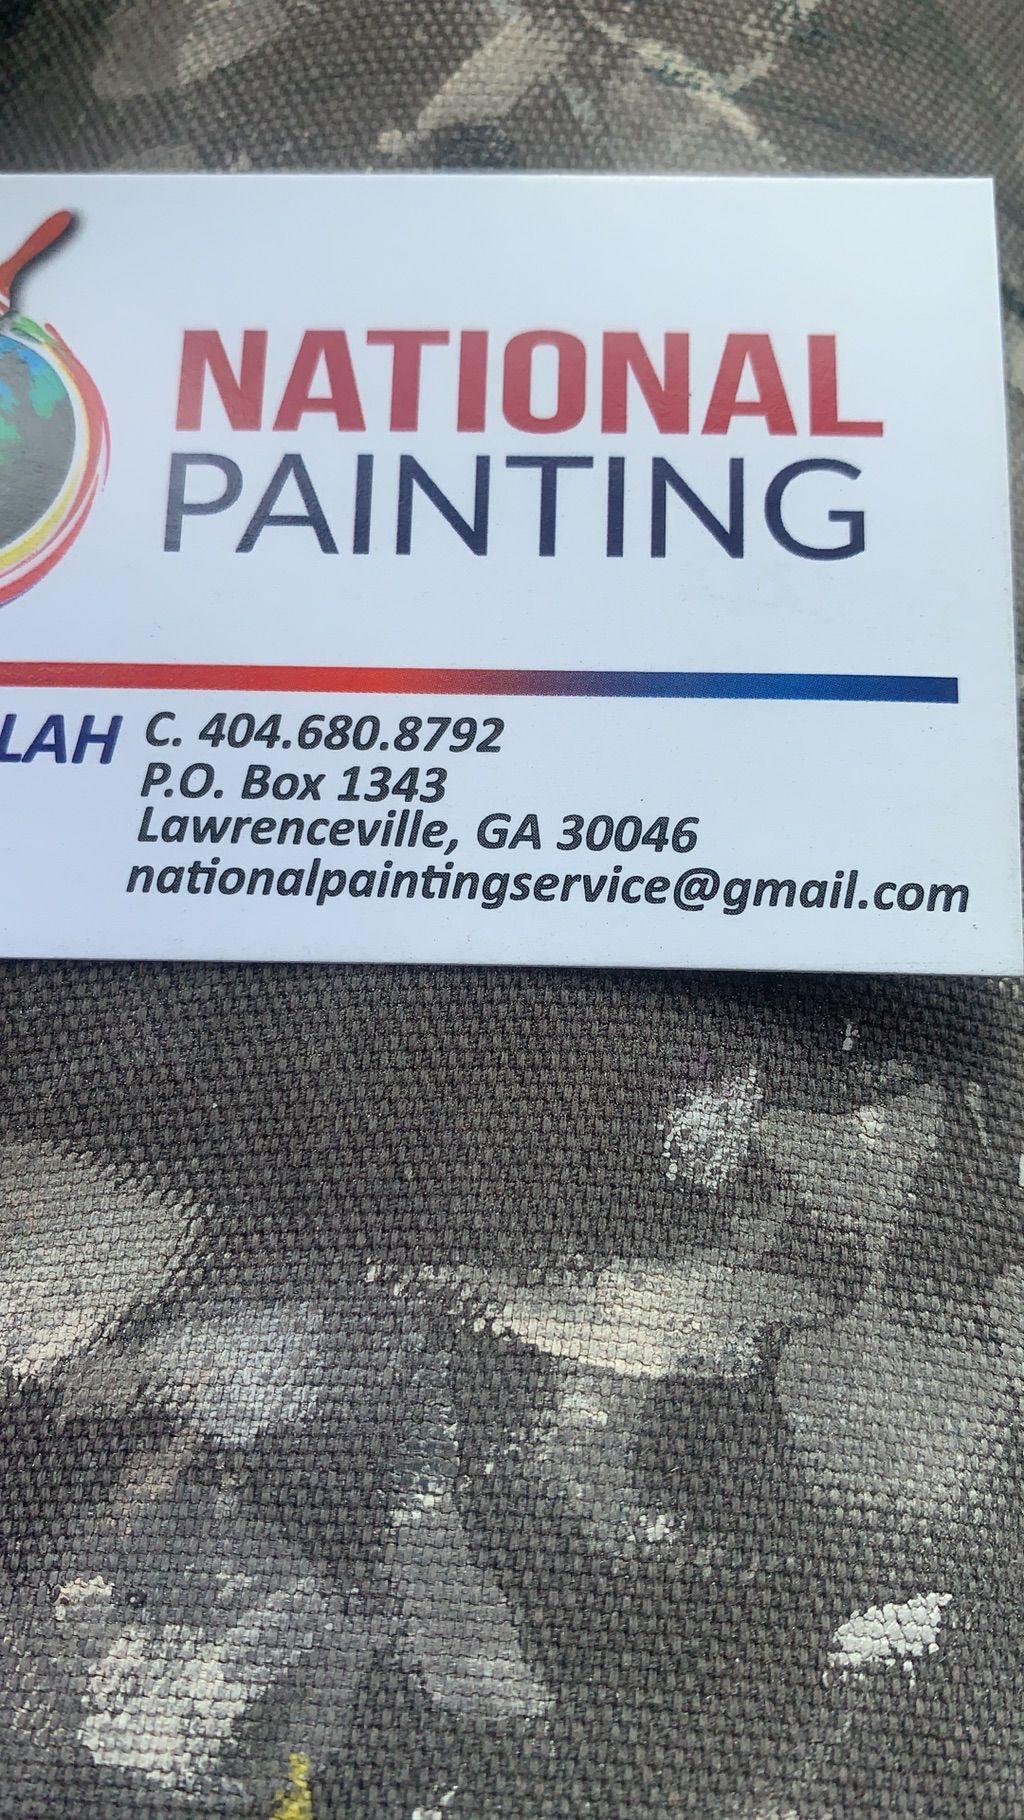 national painting services LLC Akram Salah